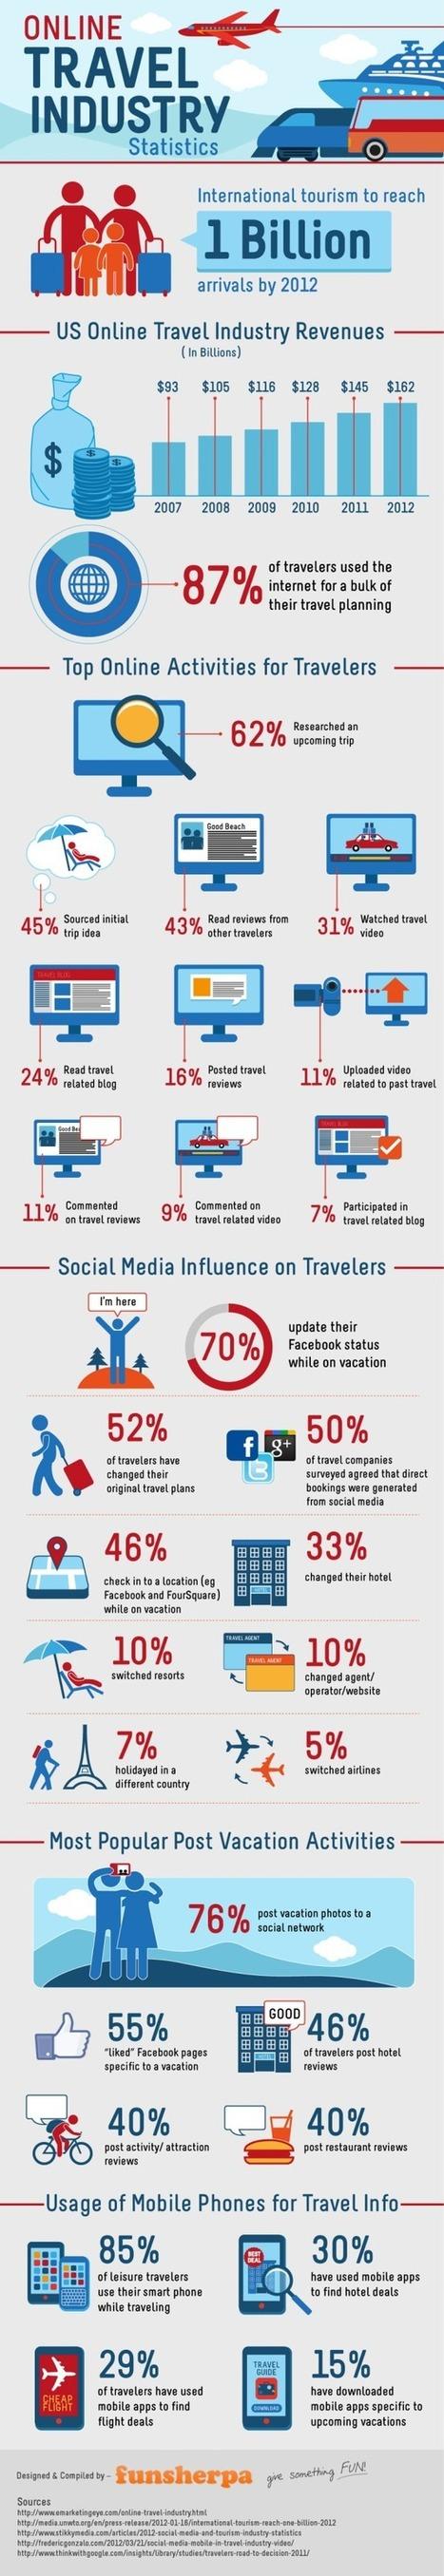 Online Travel Statistics 2012 | The World Wide Web | Scoop.it